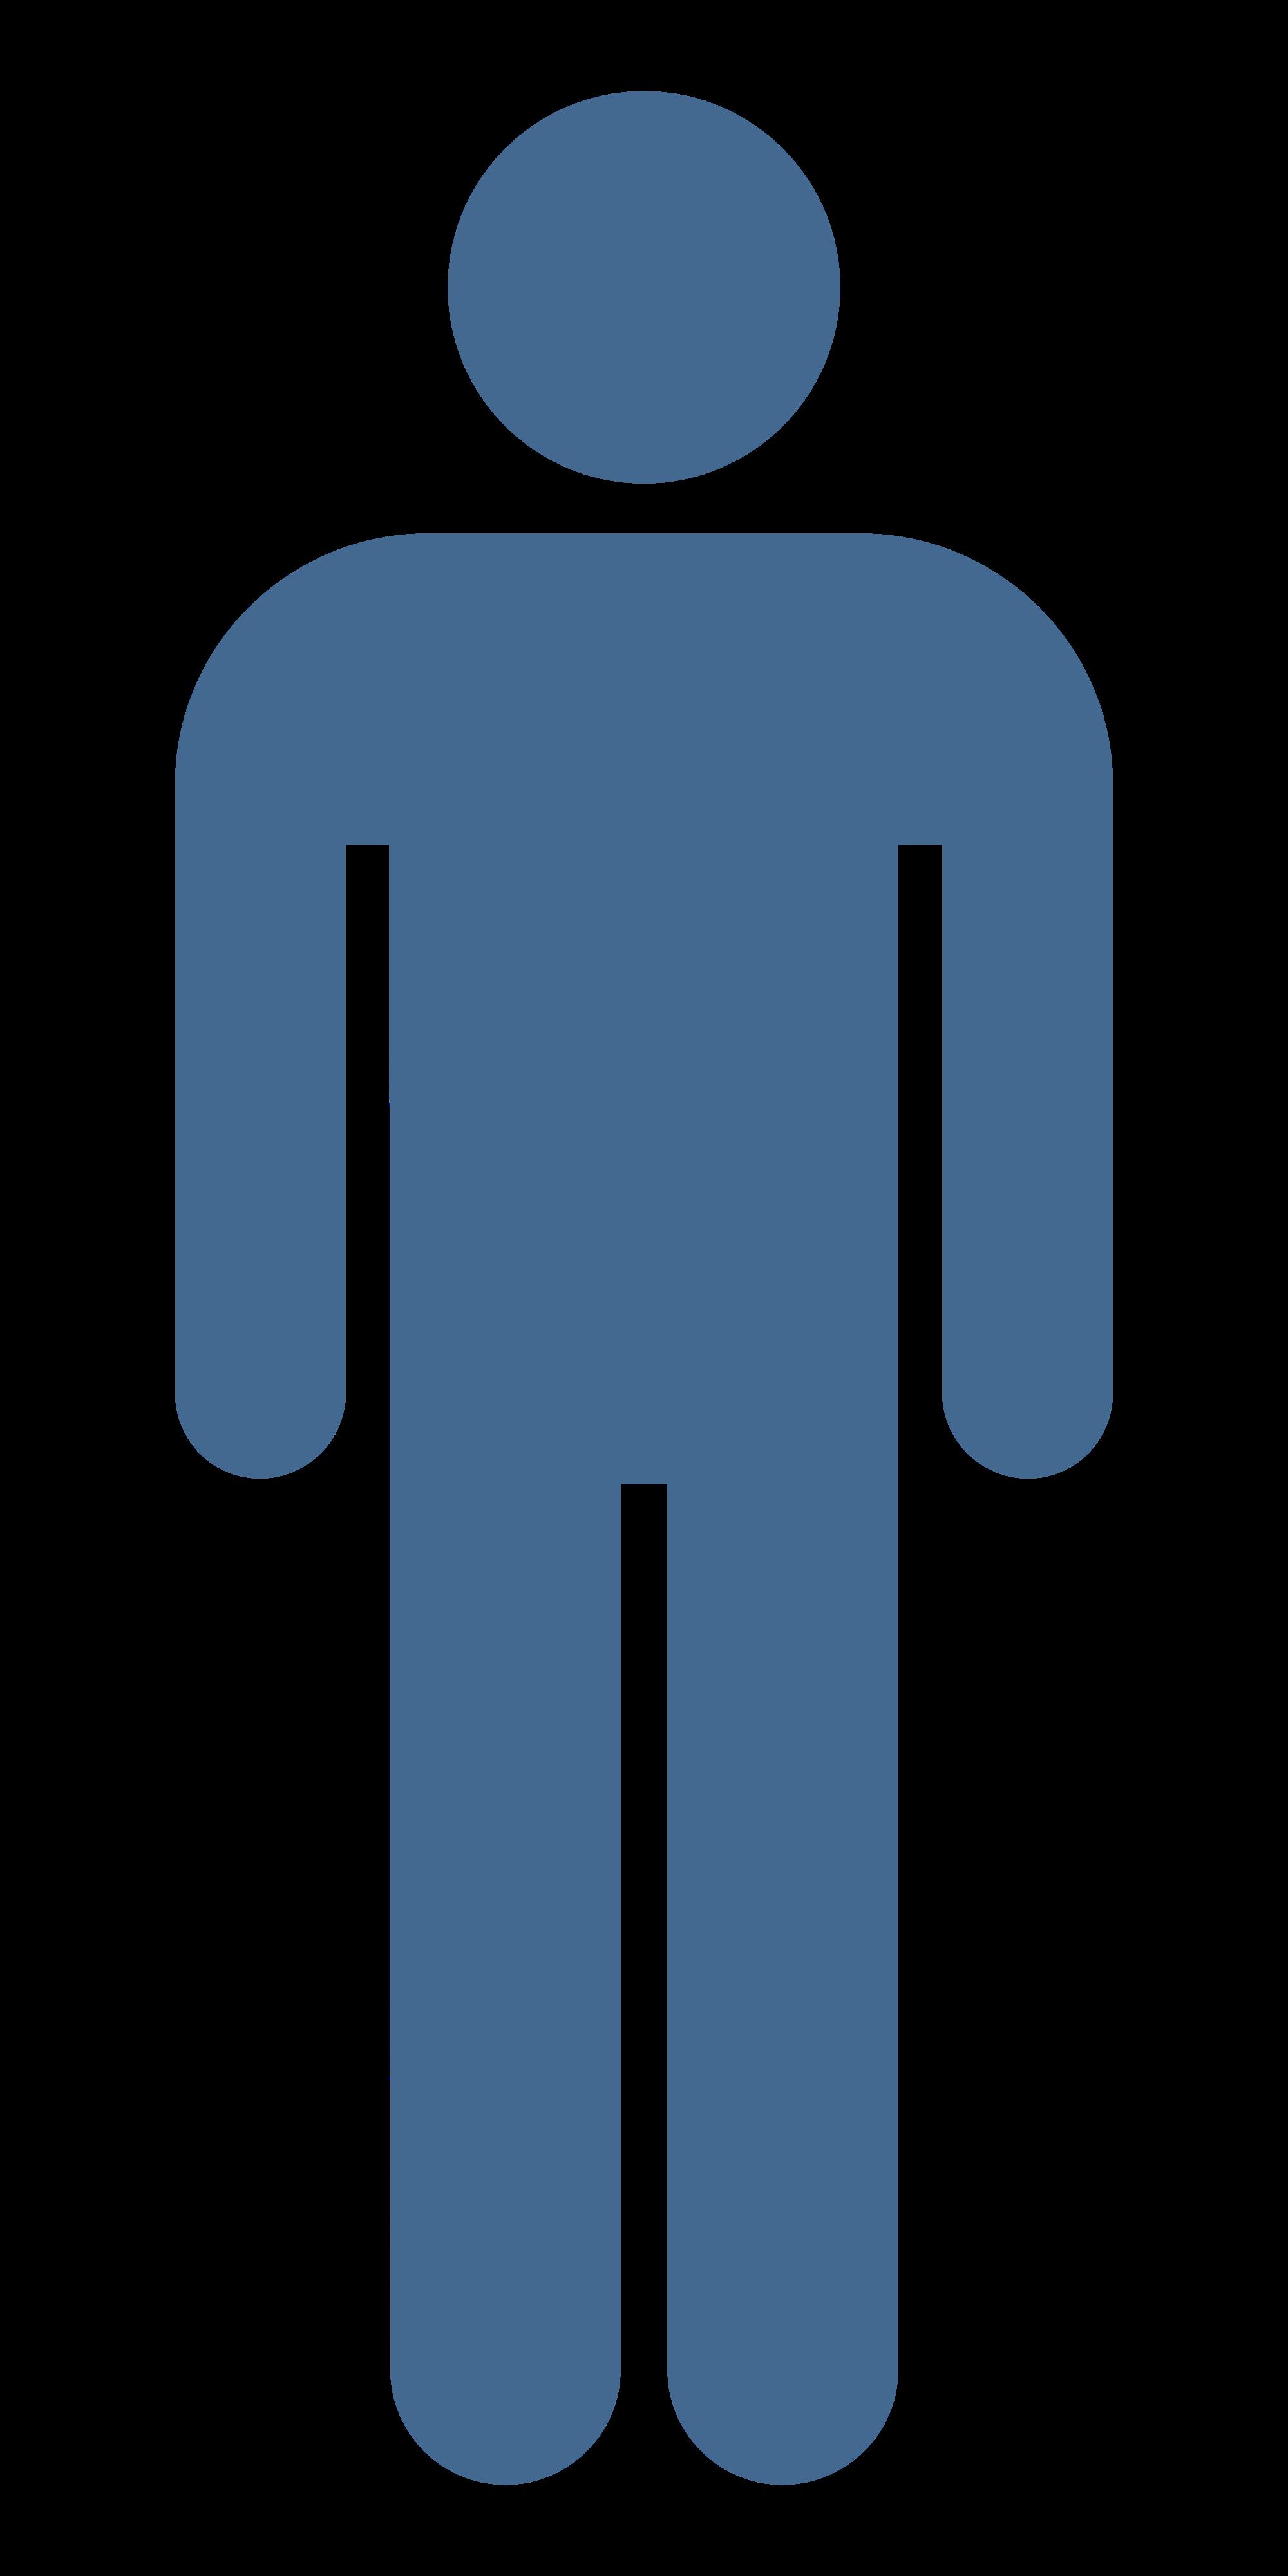 Blue person clipart.